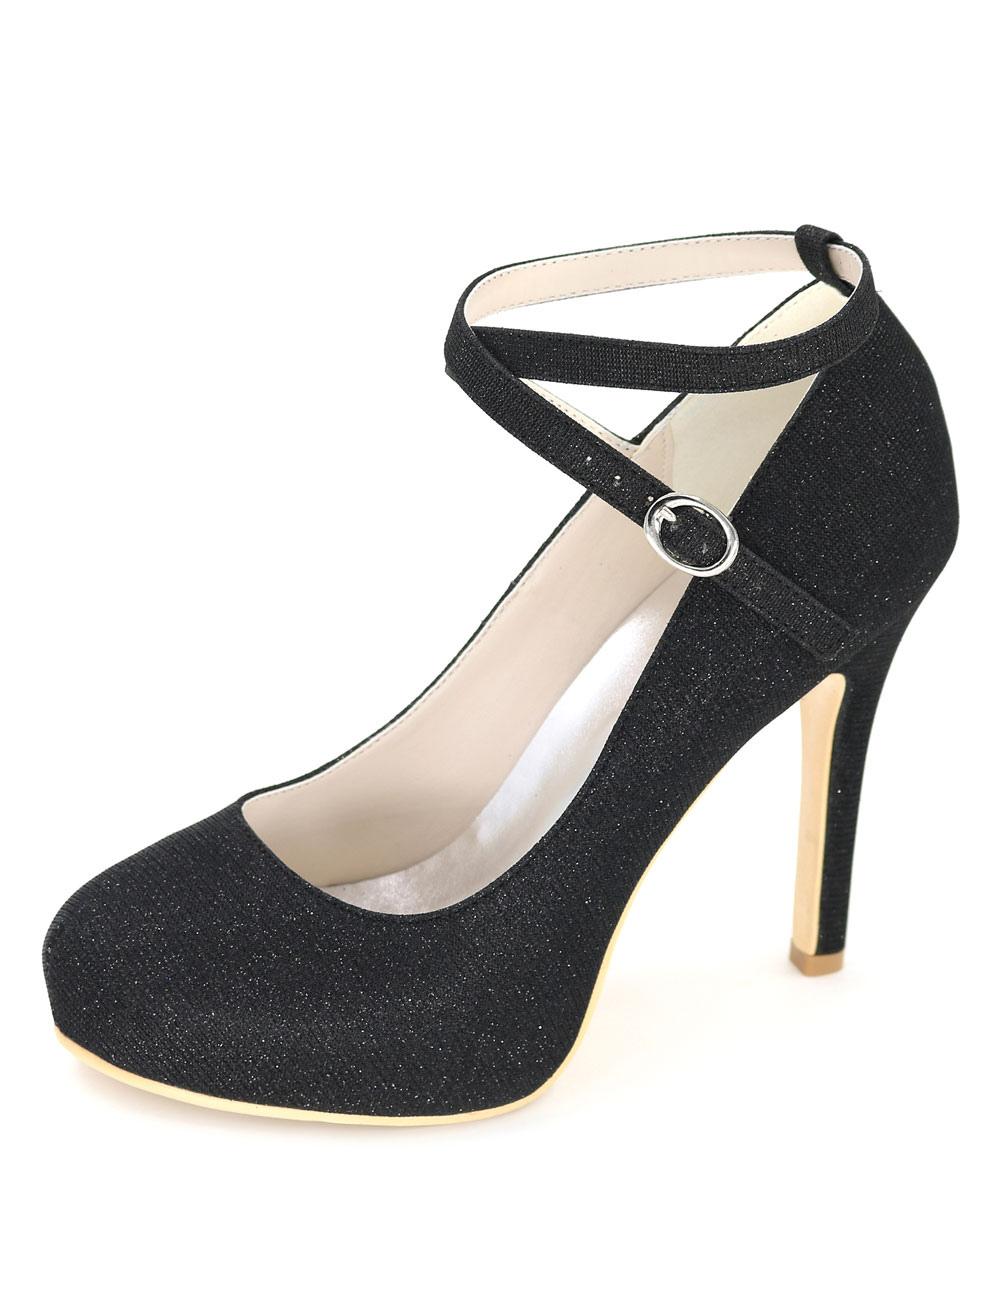 Black Wedding Shoes Platform High Heels Glitter Women's Ankle Strap Stiletto Bridal Shoes